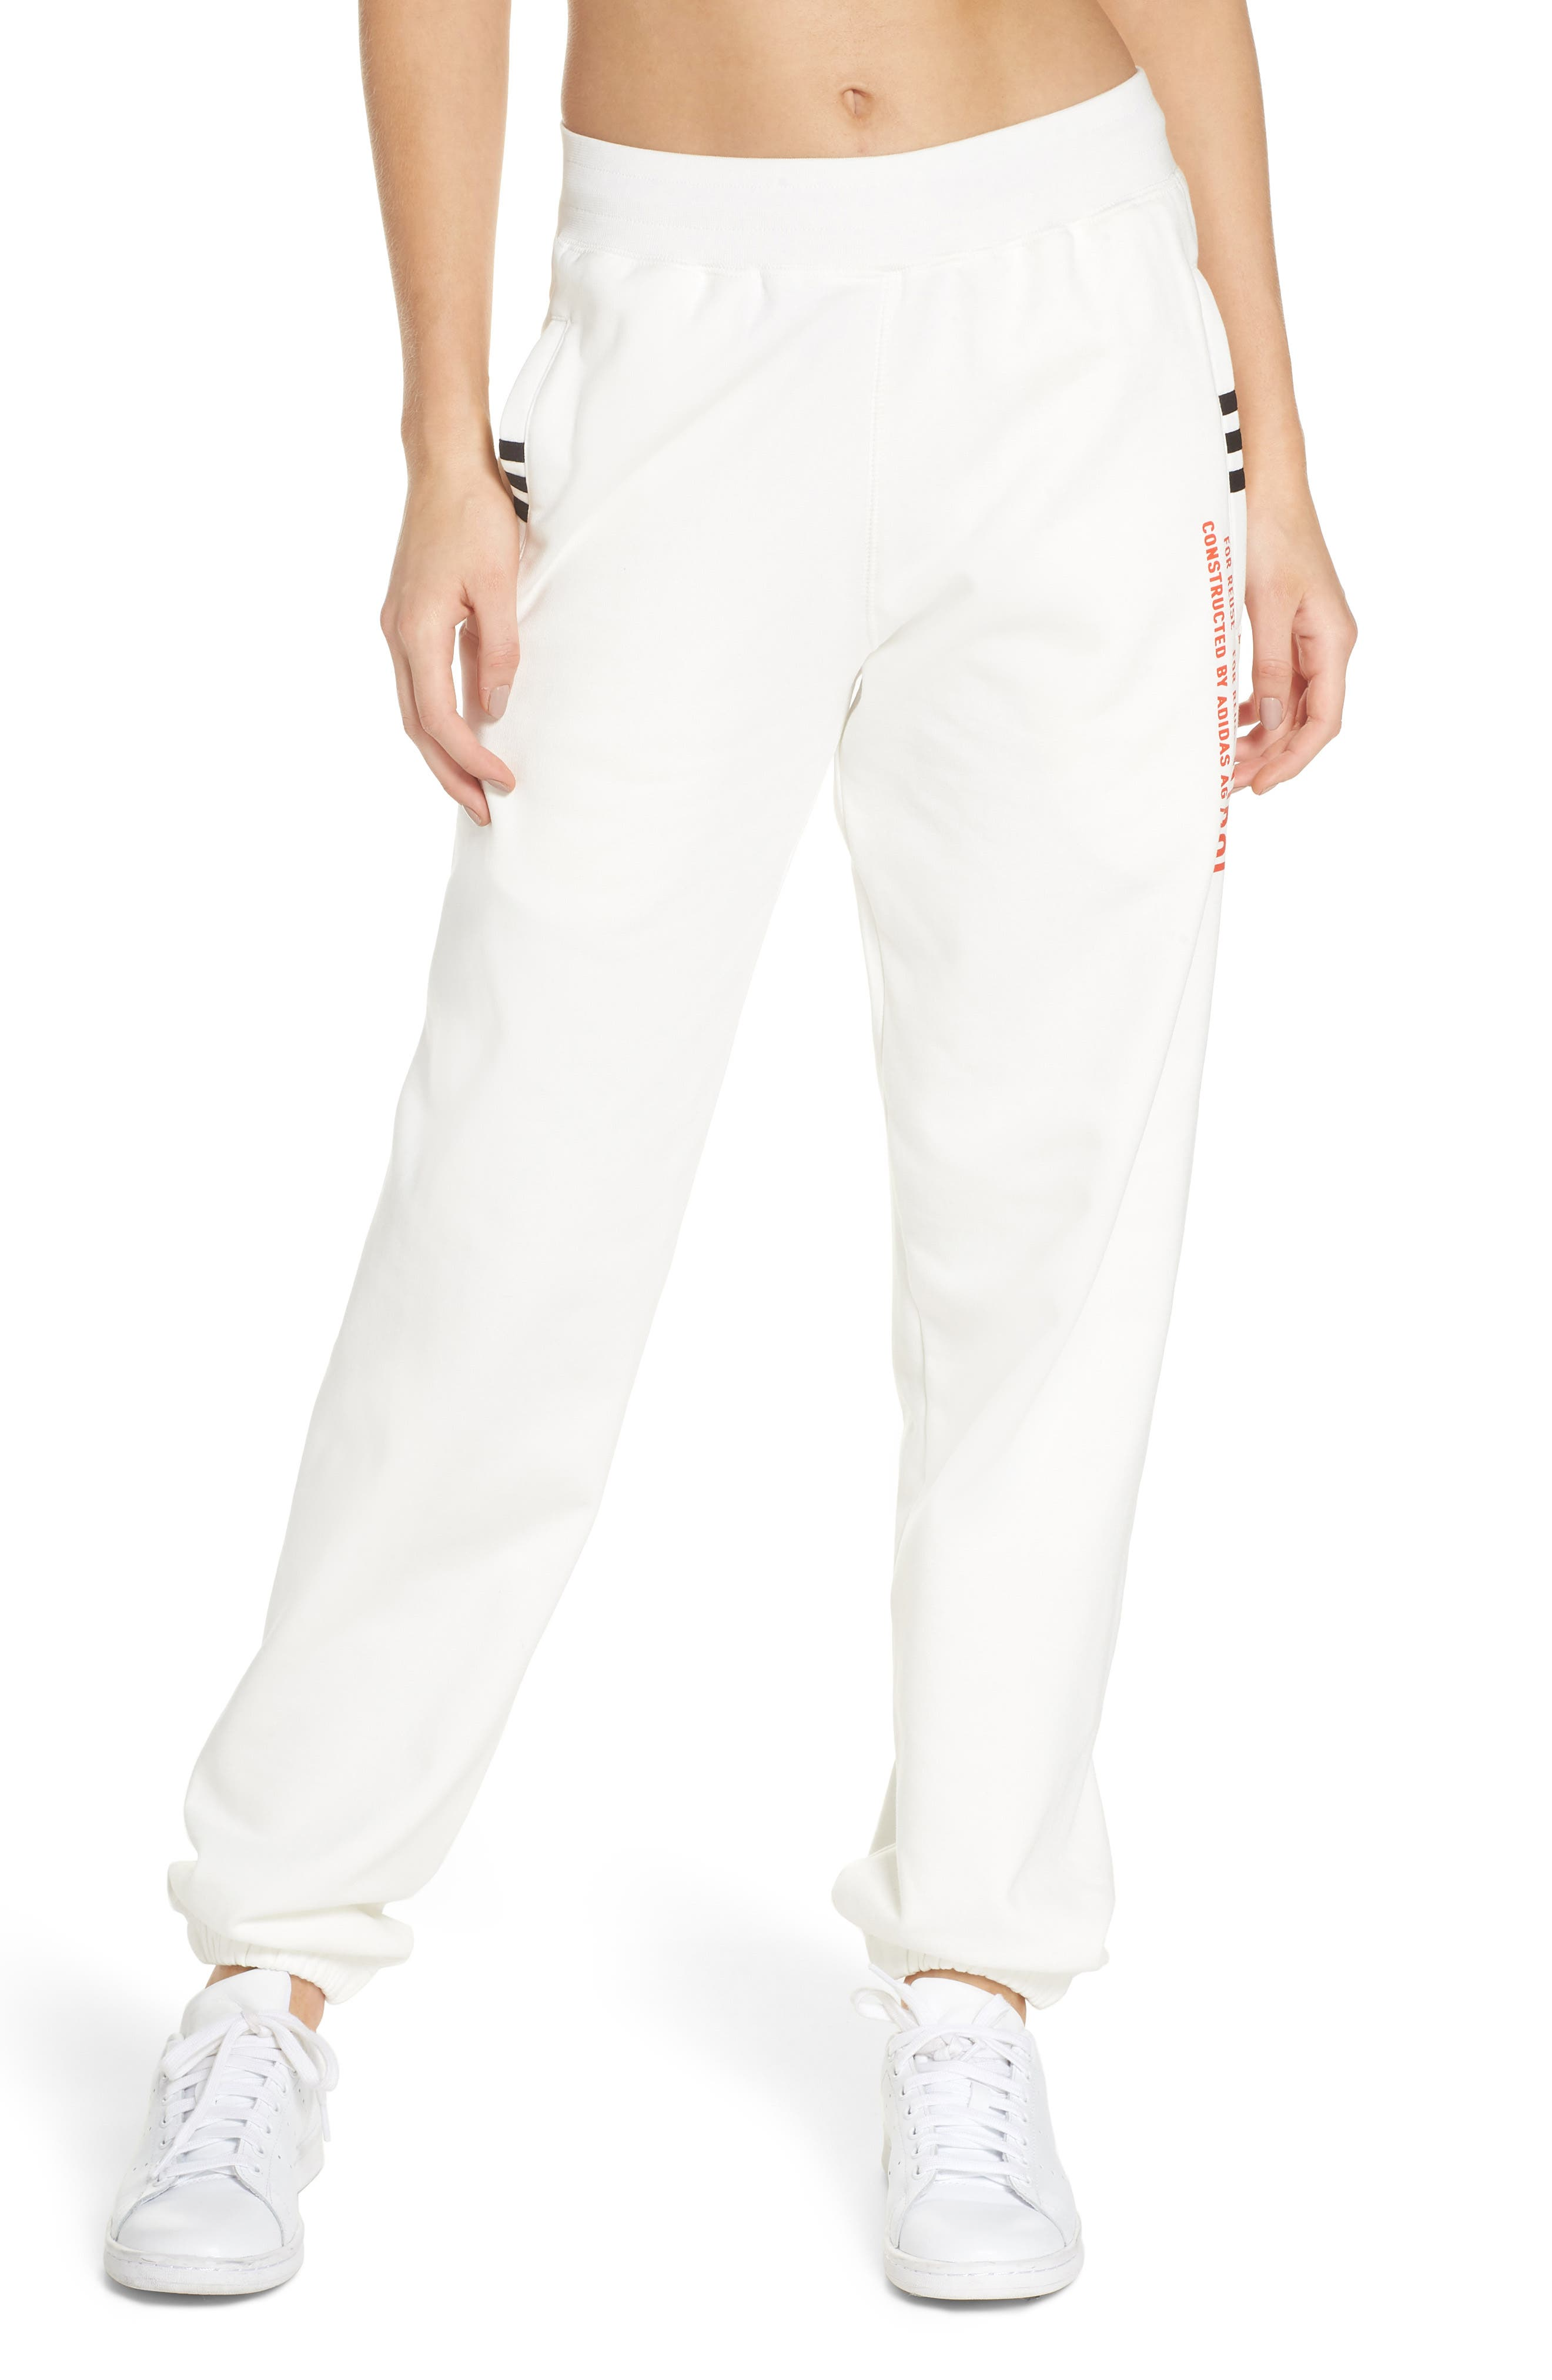 Alternate Image 1 Selected - adidas x Alexander Wang Graphite Jogger Pants